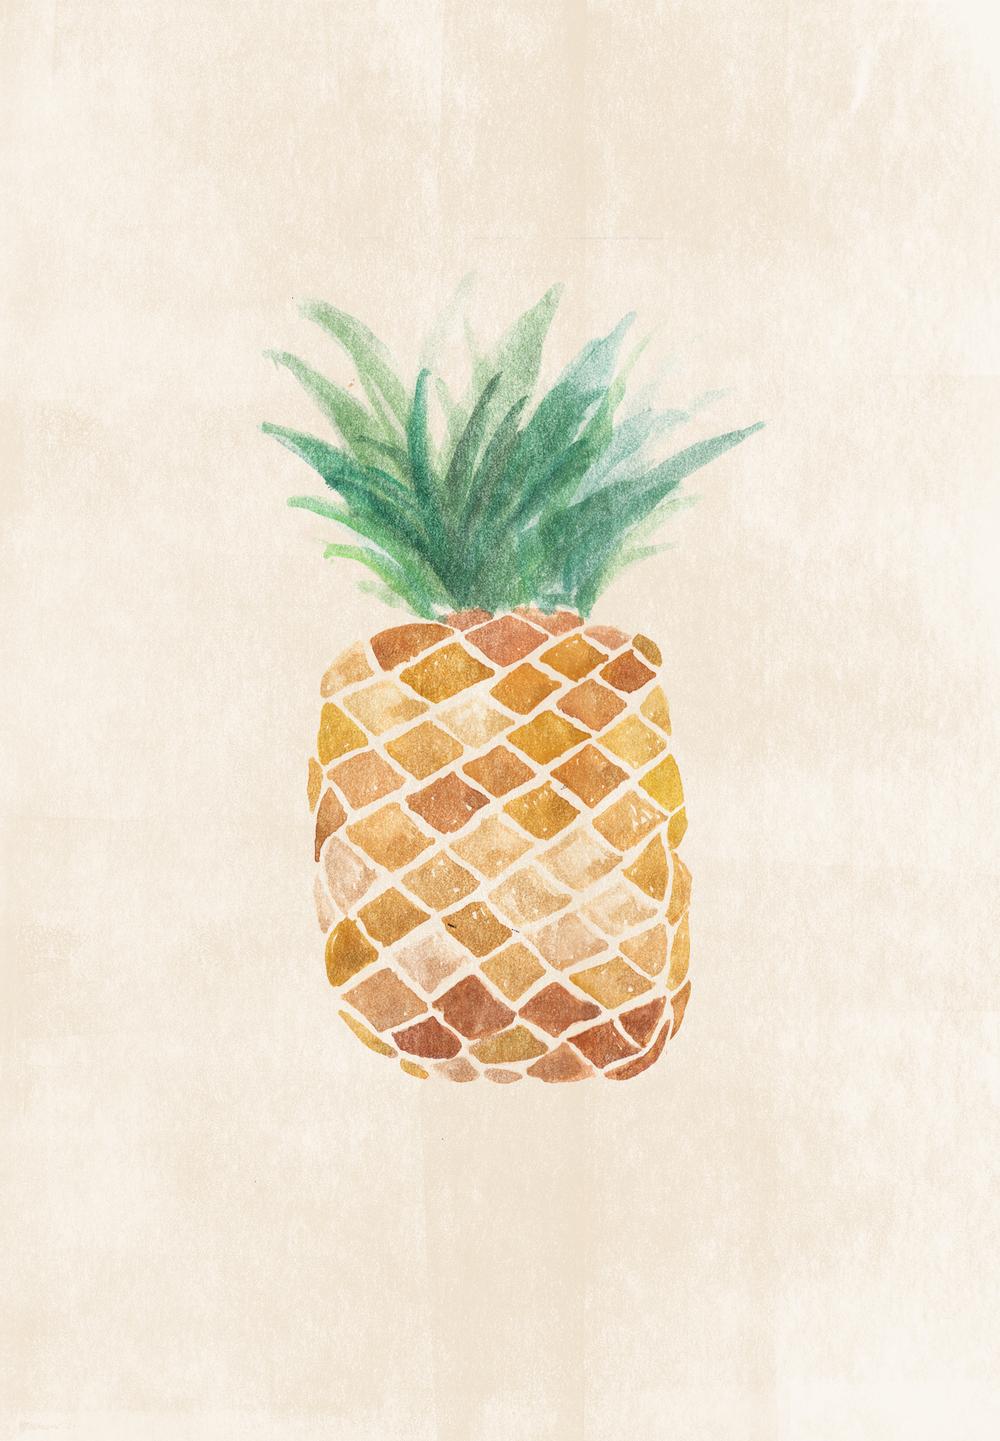 pineapple-insta.jpg